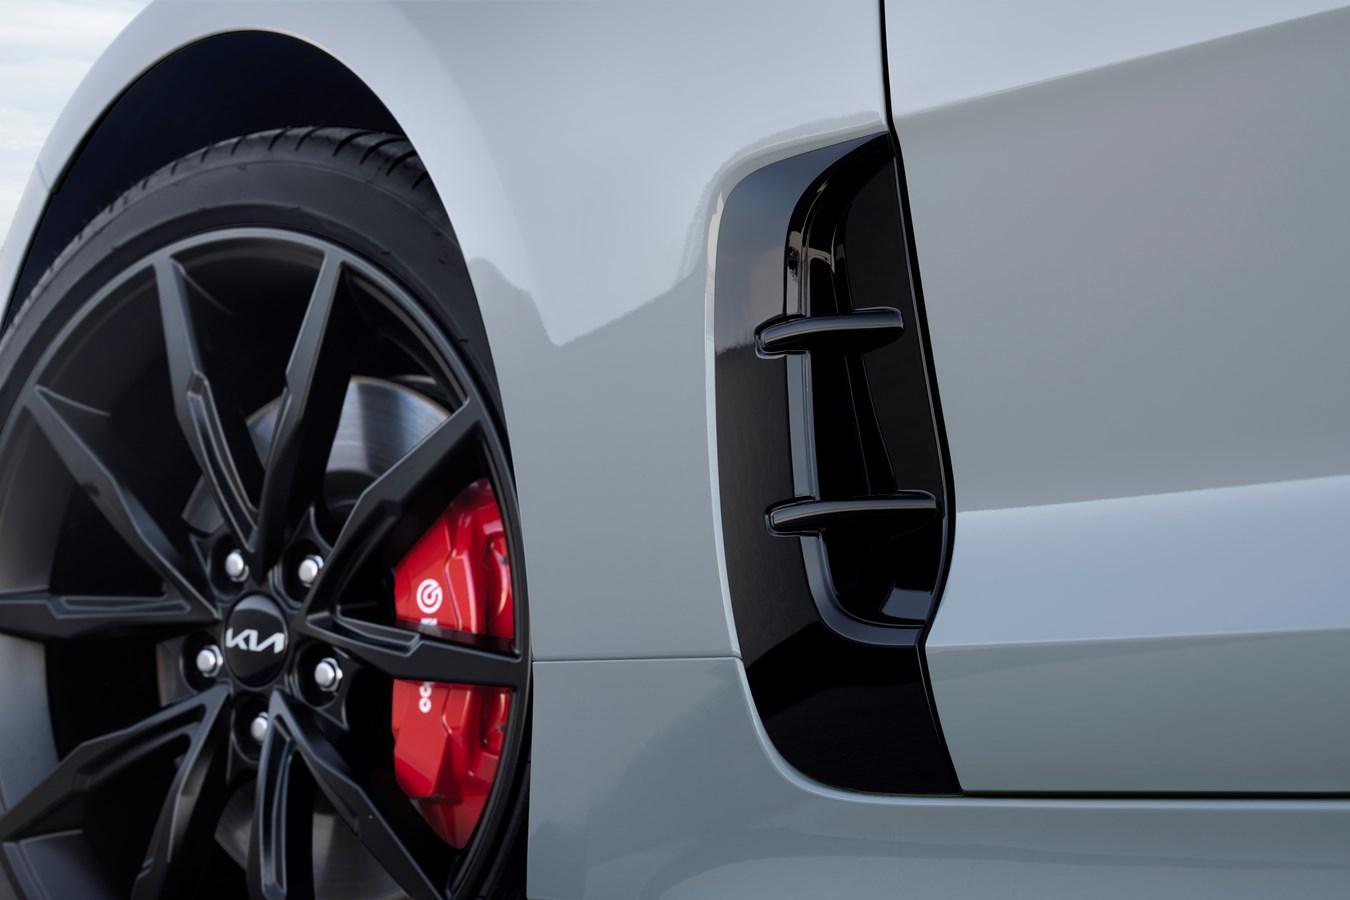 2022 Stinger Scorpion Special Edition vent wheel tire close